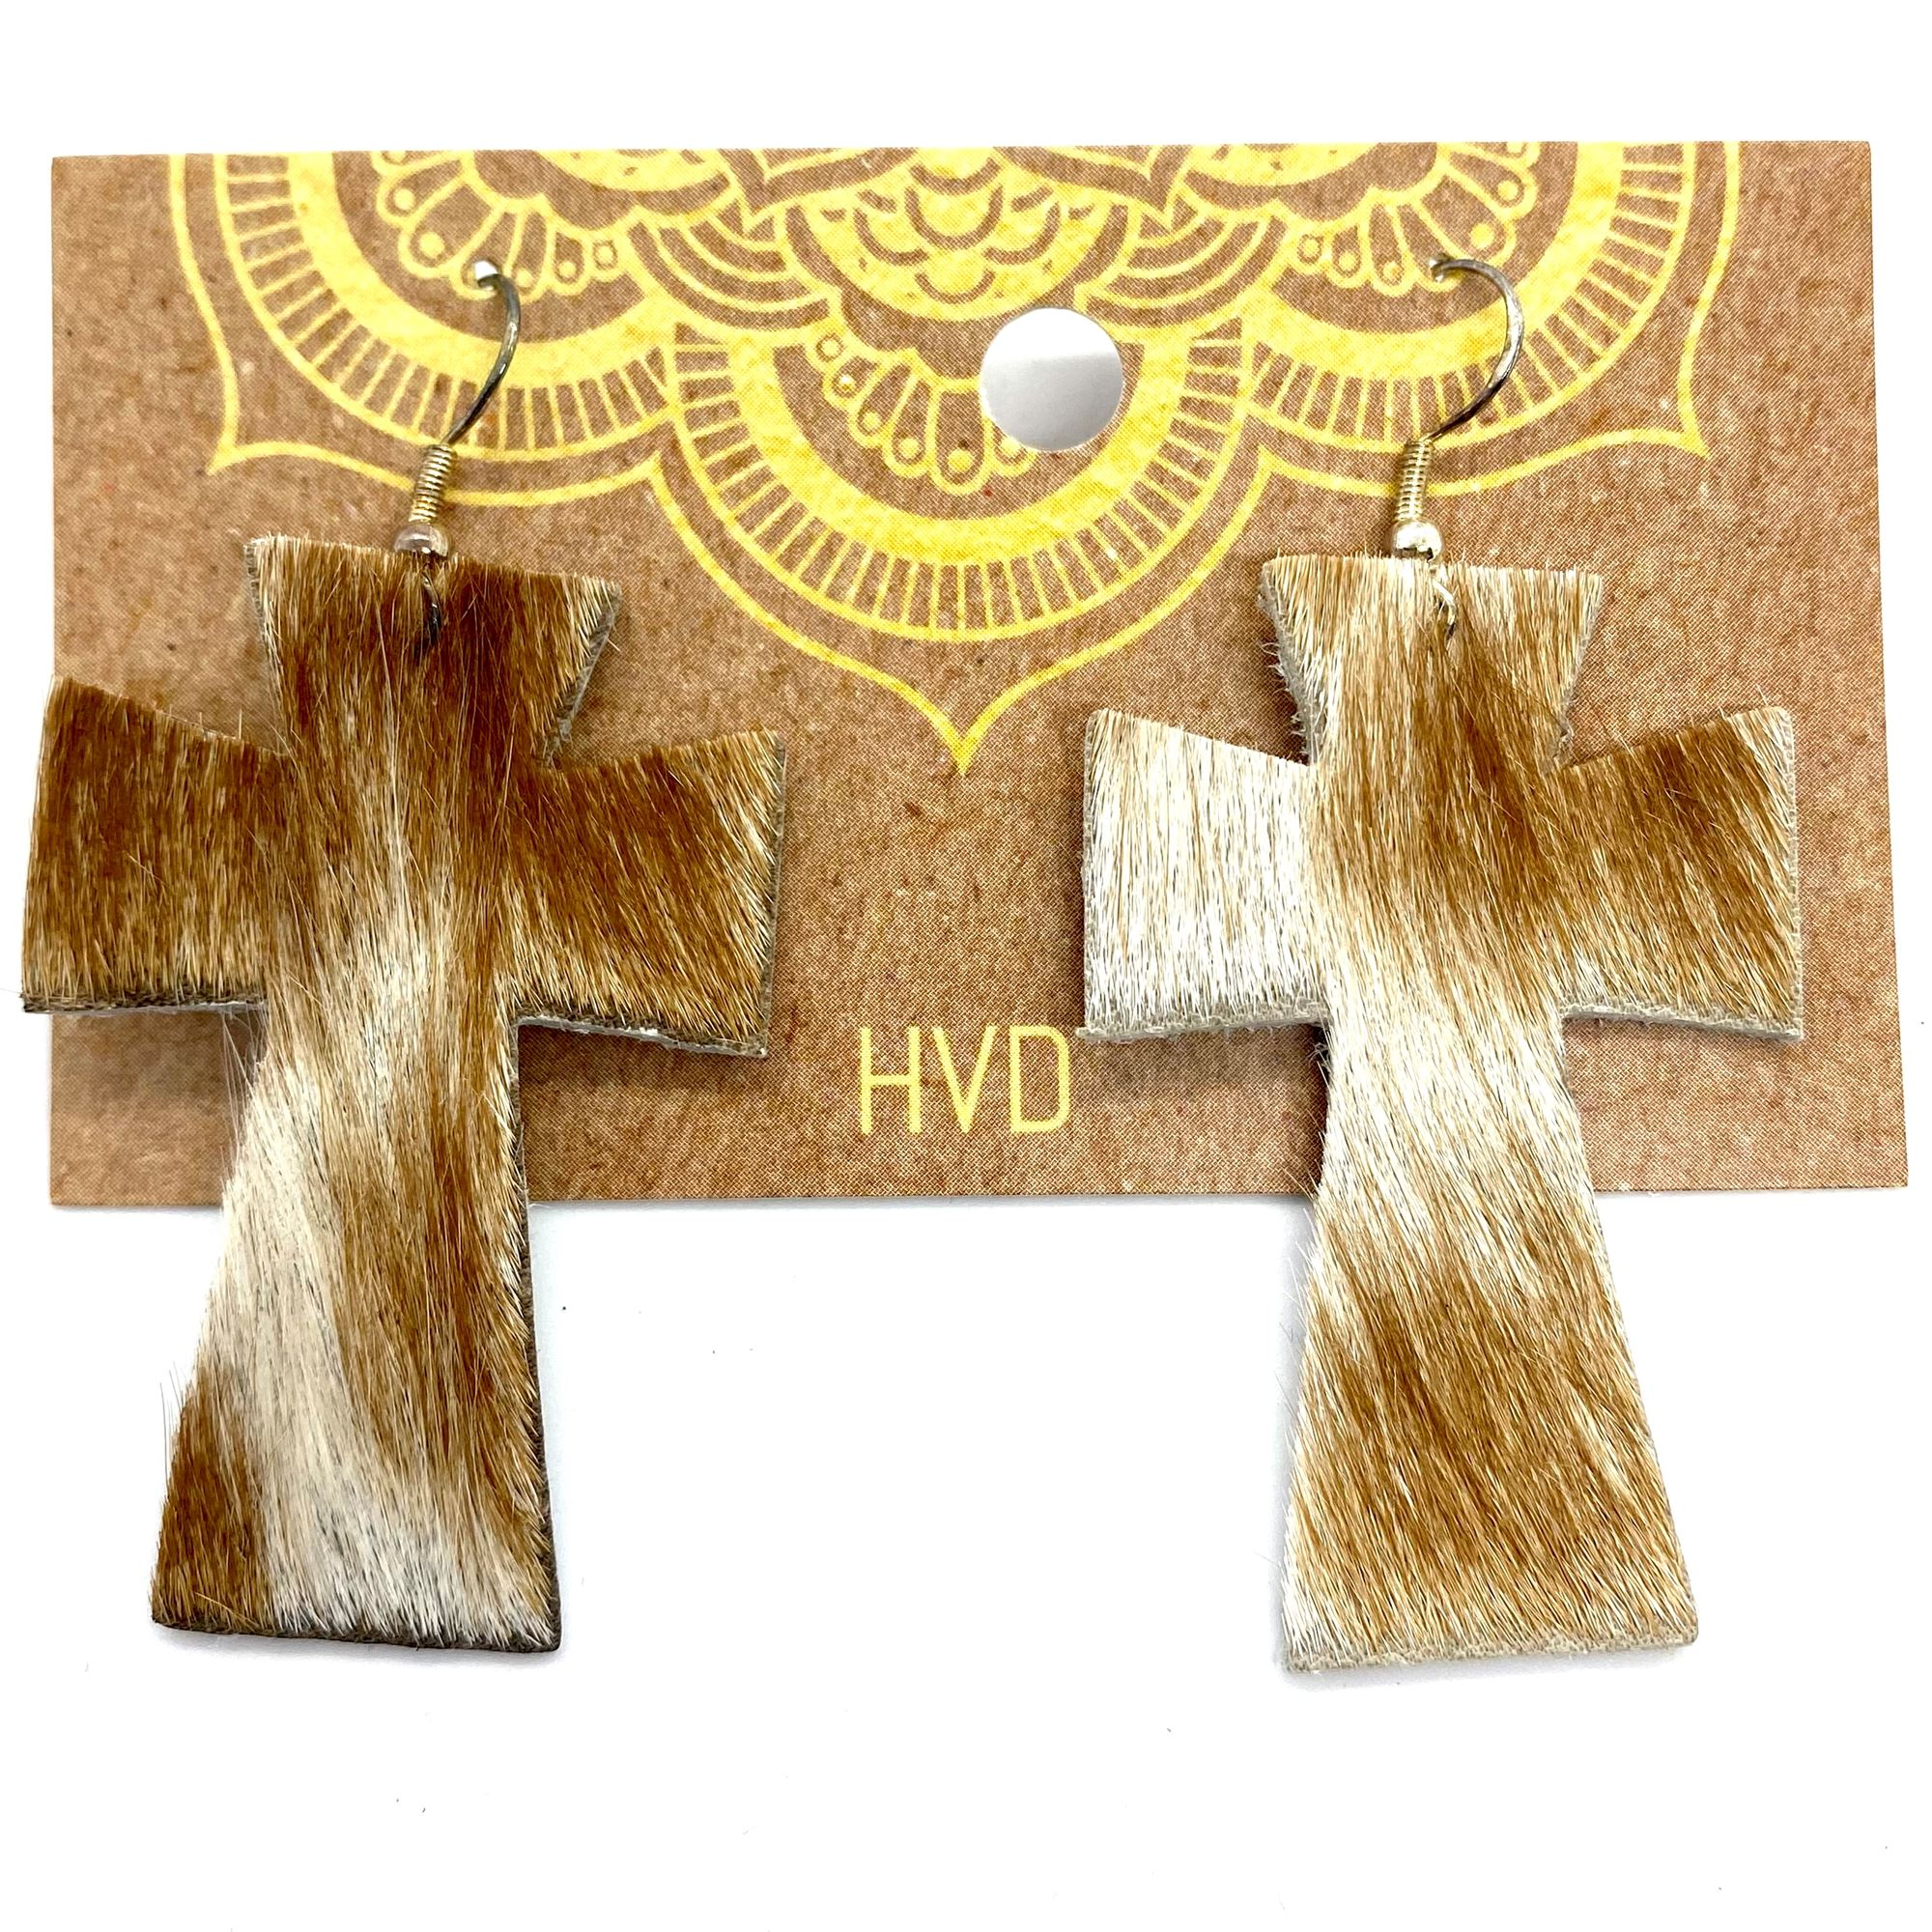 Tan & White Hair-On-Hide Cross Earrings